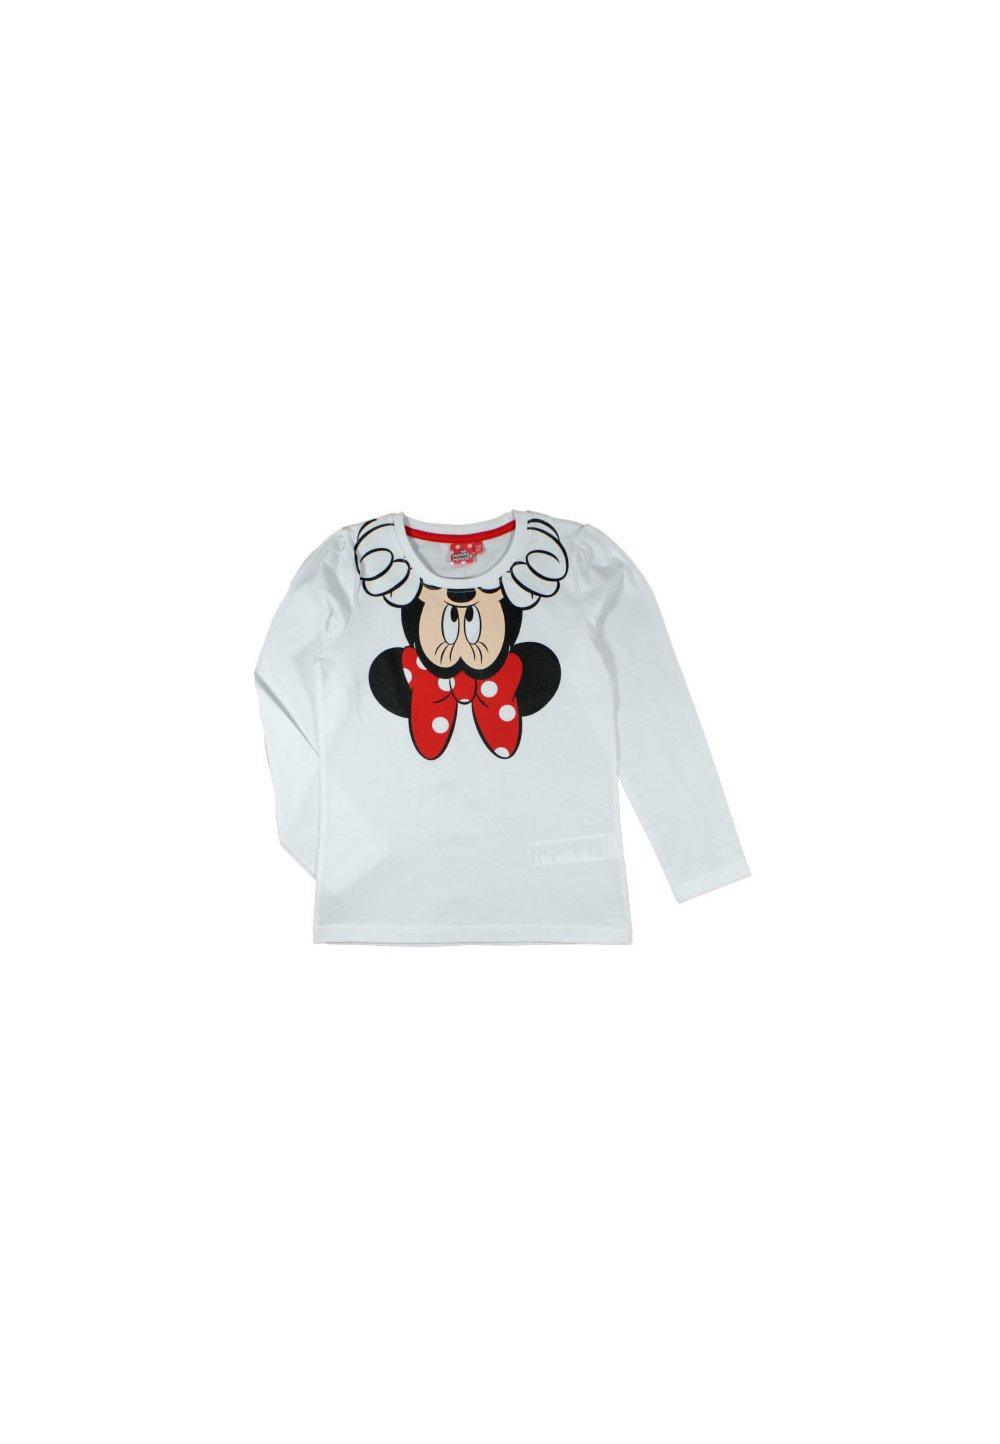 Bluza Alba, Minnie Mouse Cu Fundita Rosie